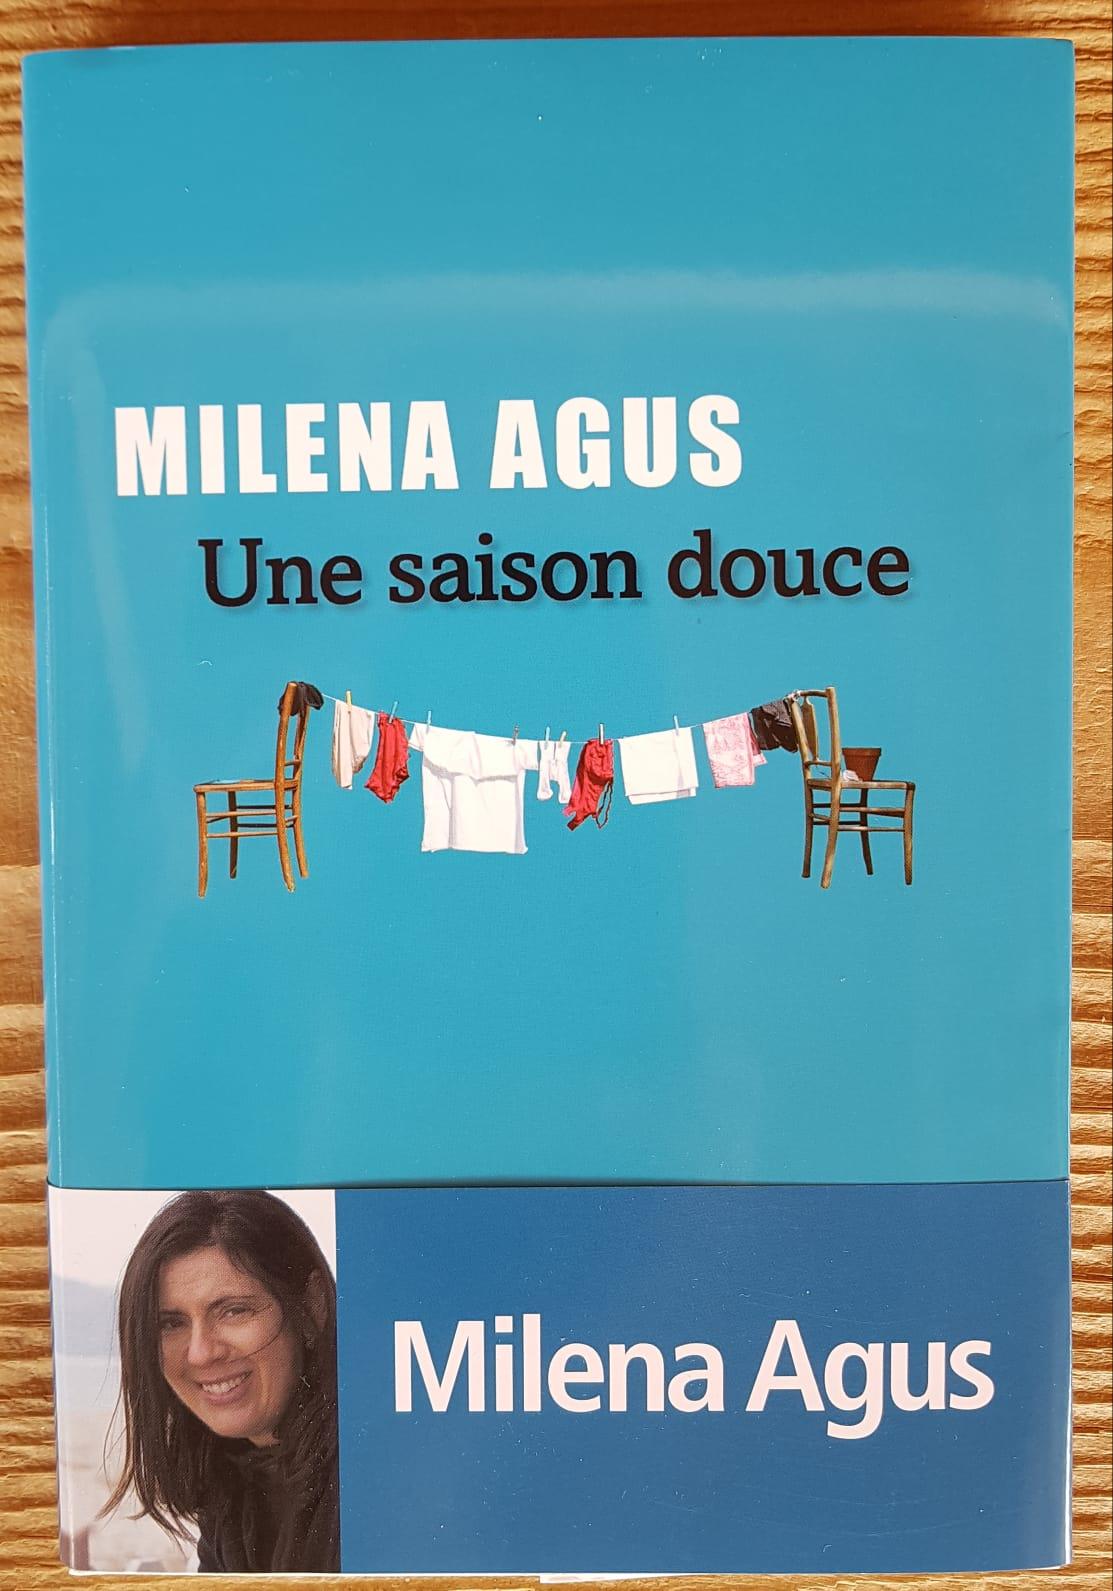 Milena agus une saison douce